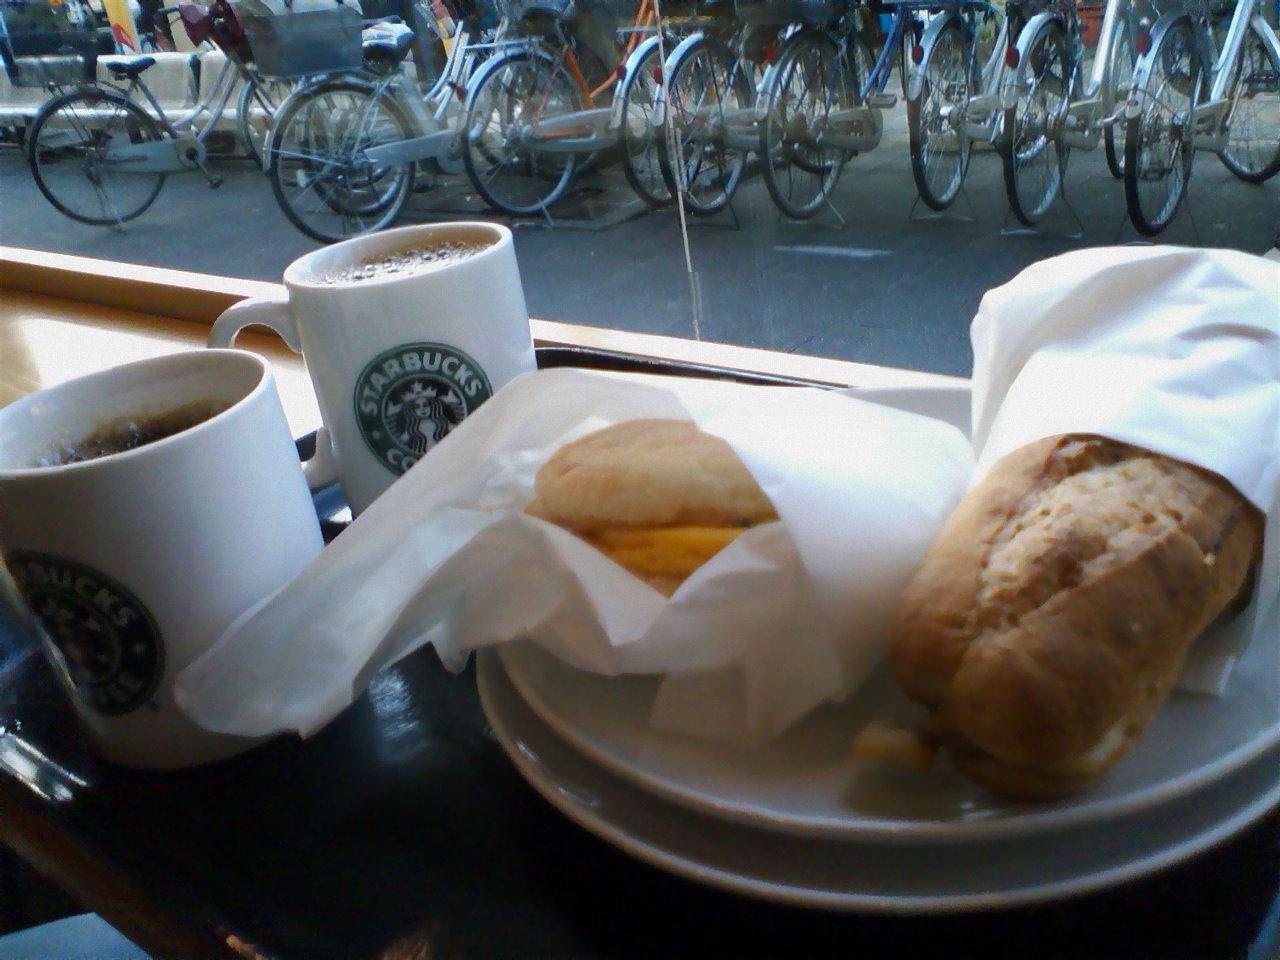 Starbucksで小腹_c0206645_18562991.jpg